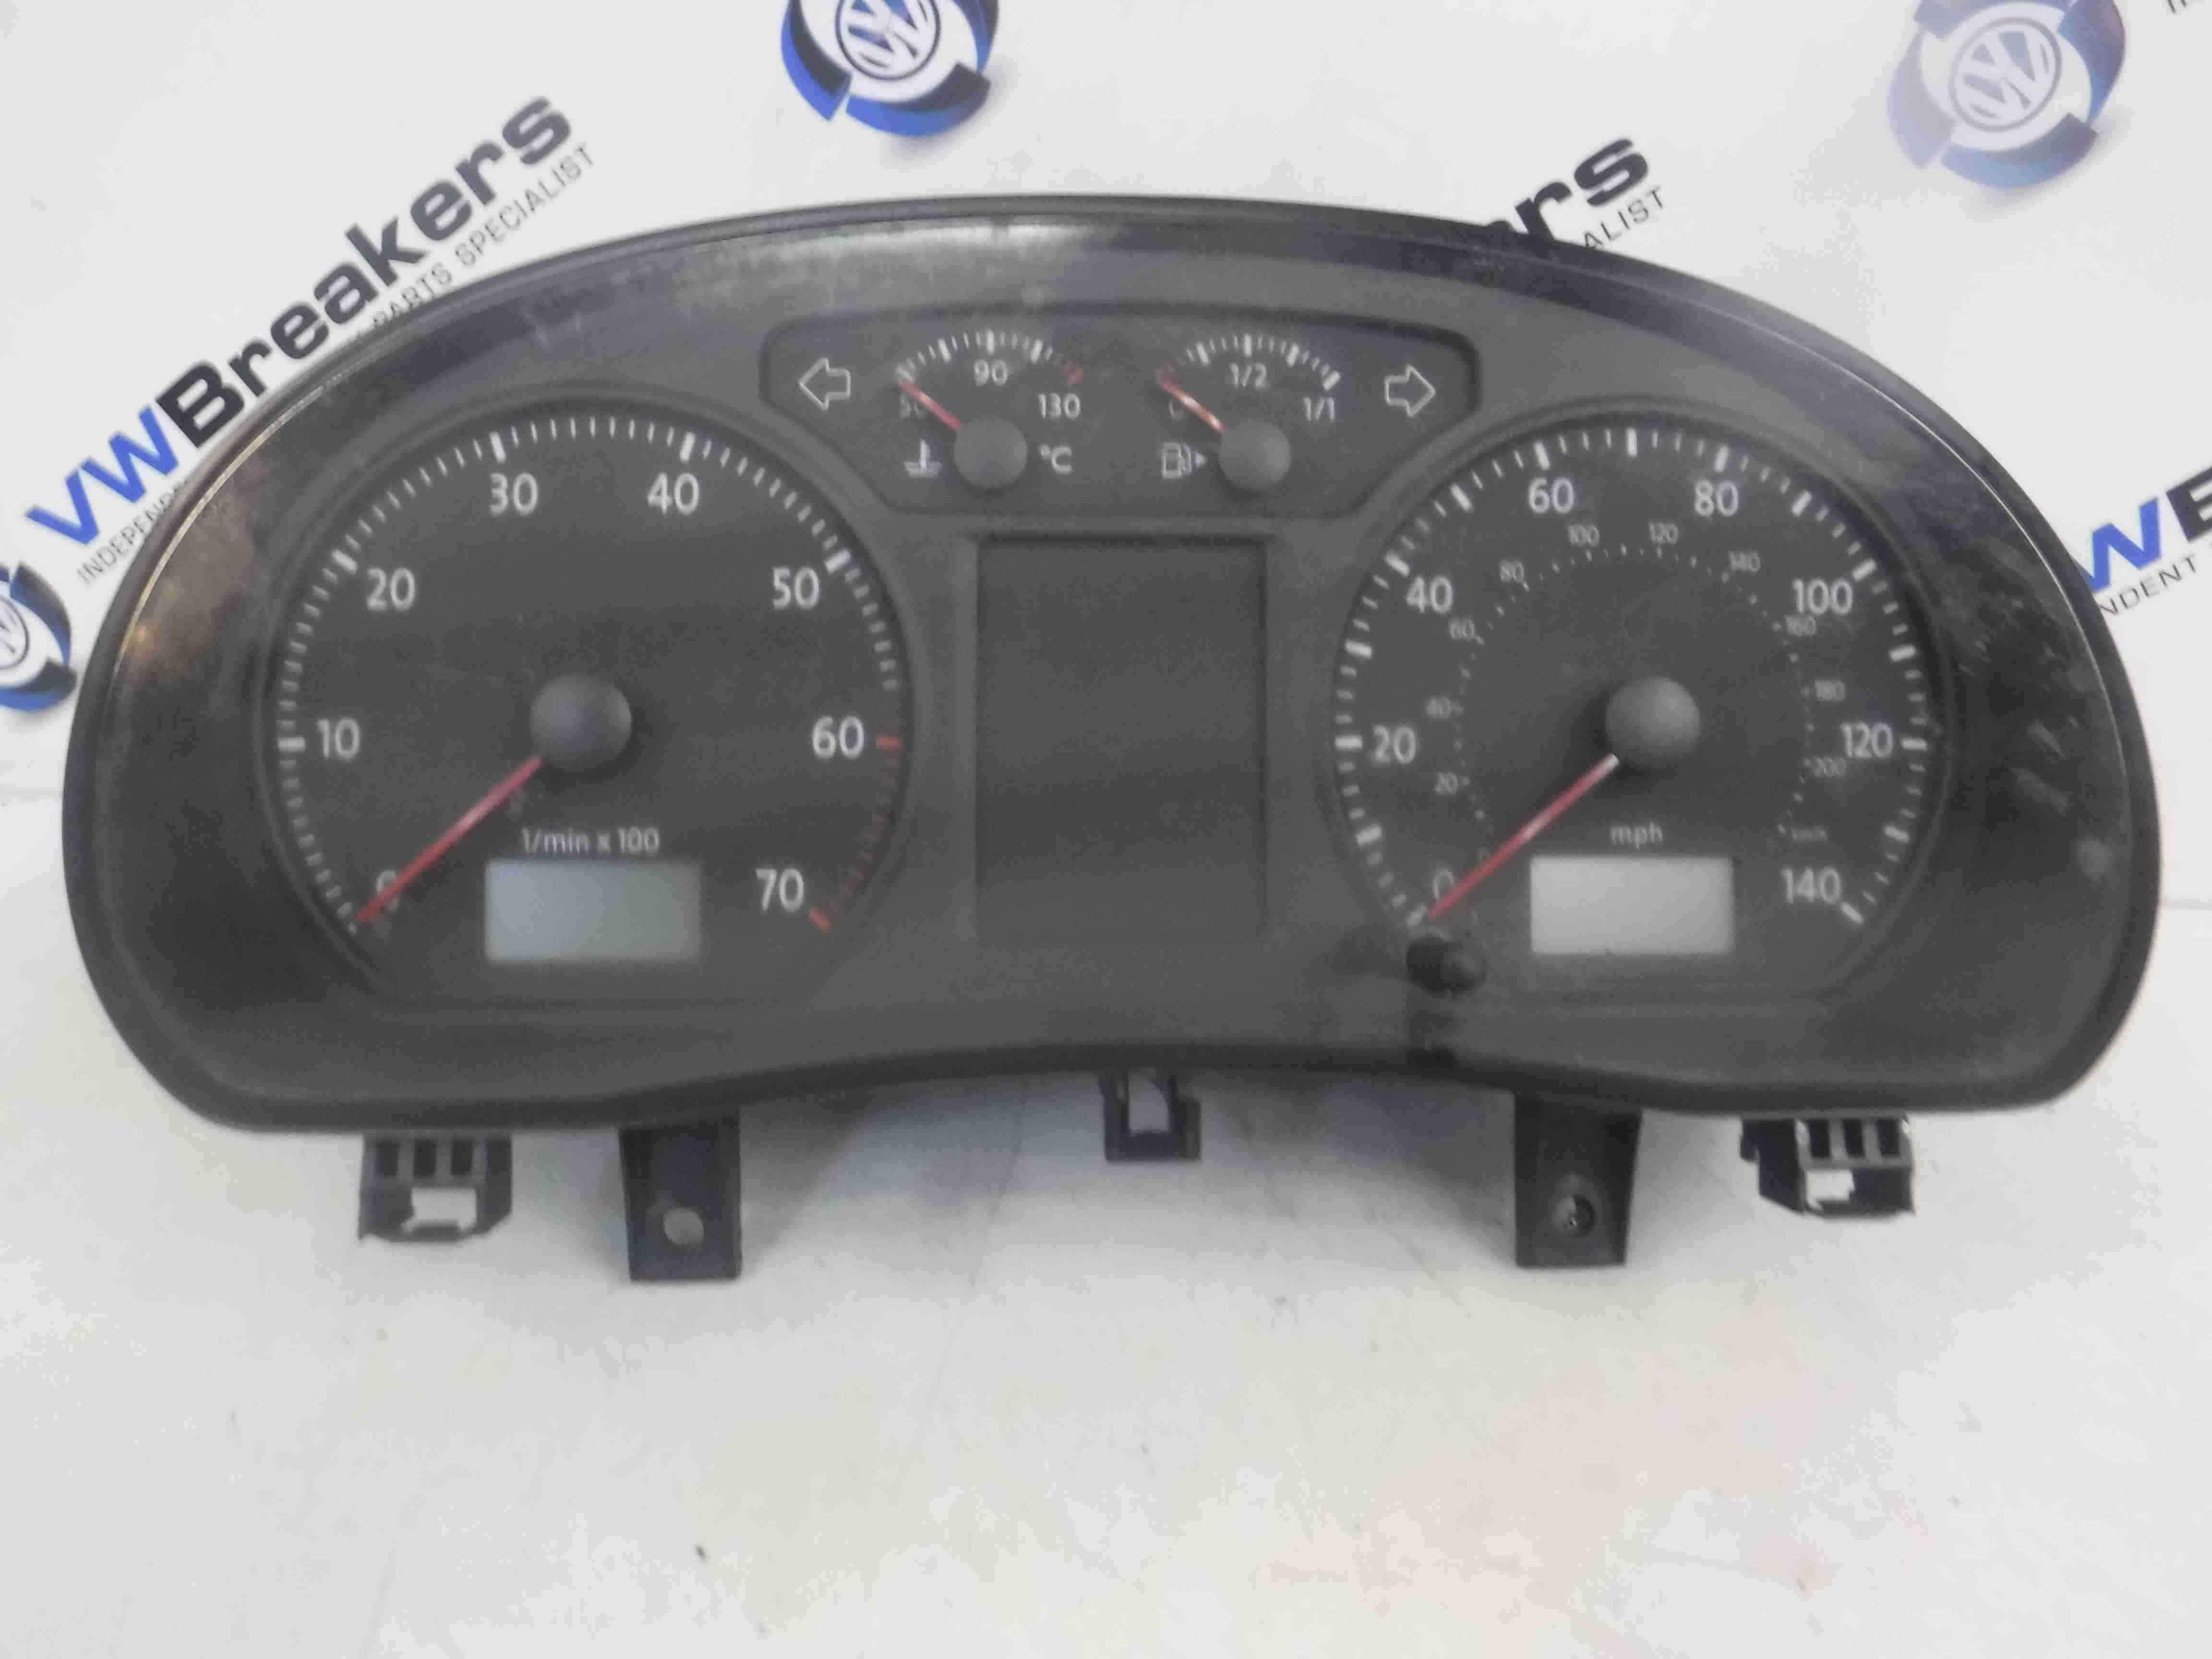 Volkswagen Polo 9N3 2006-2008 Instrument Panel Dials Clocks Cluster 97K